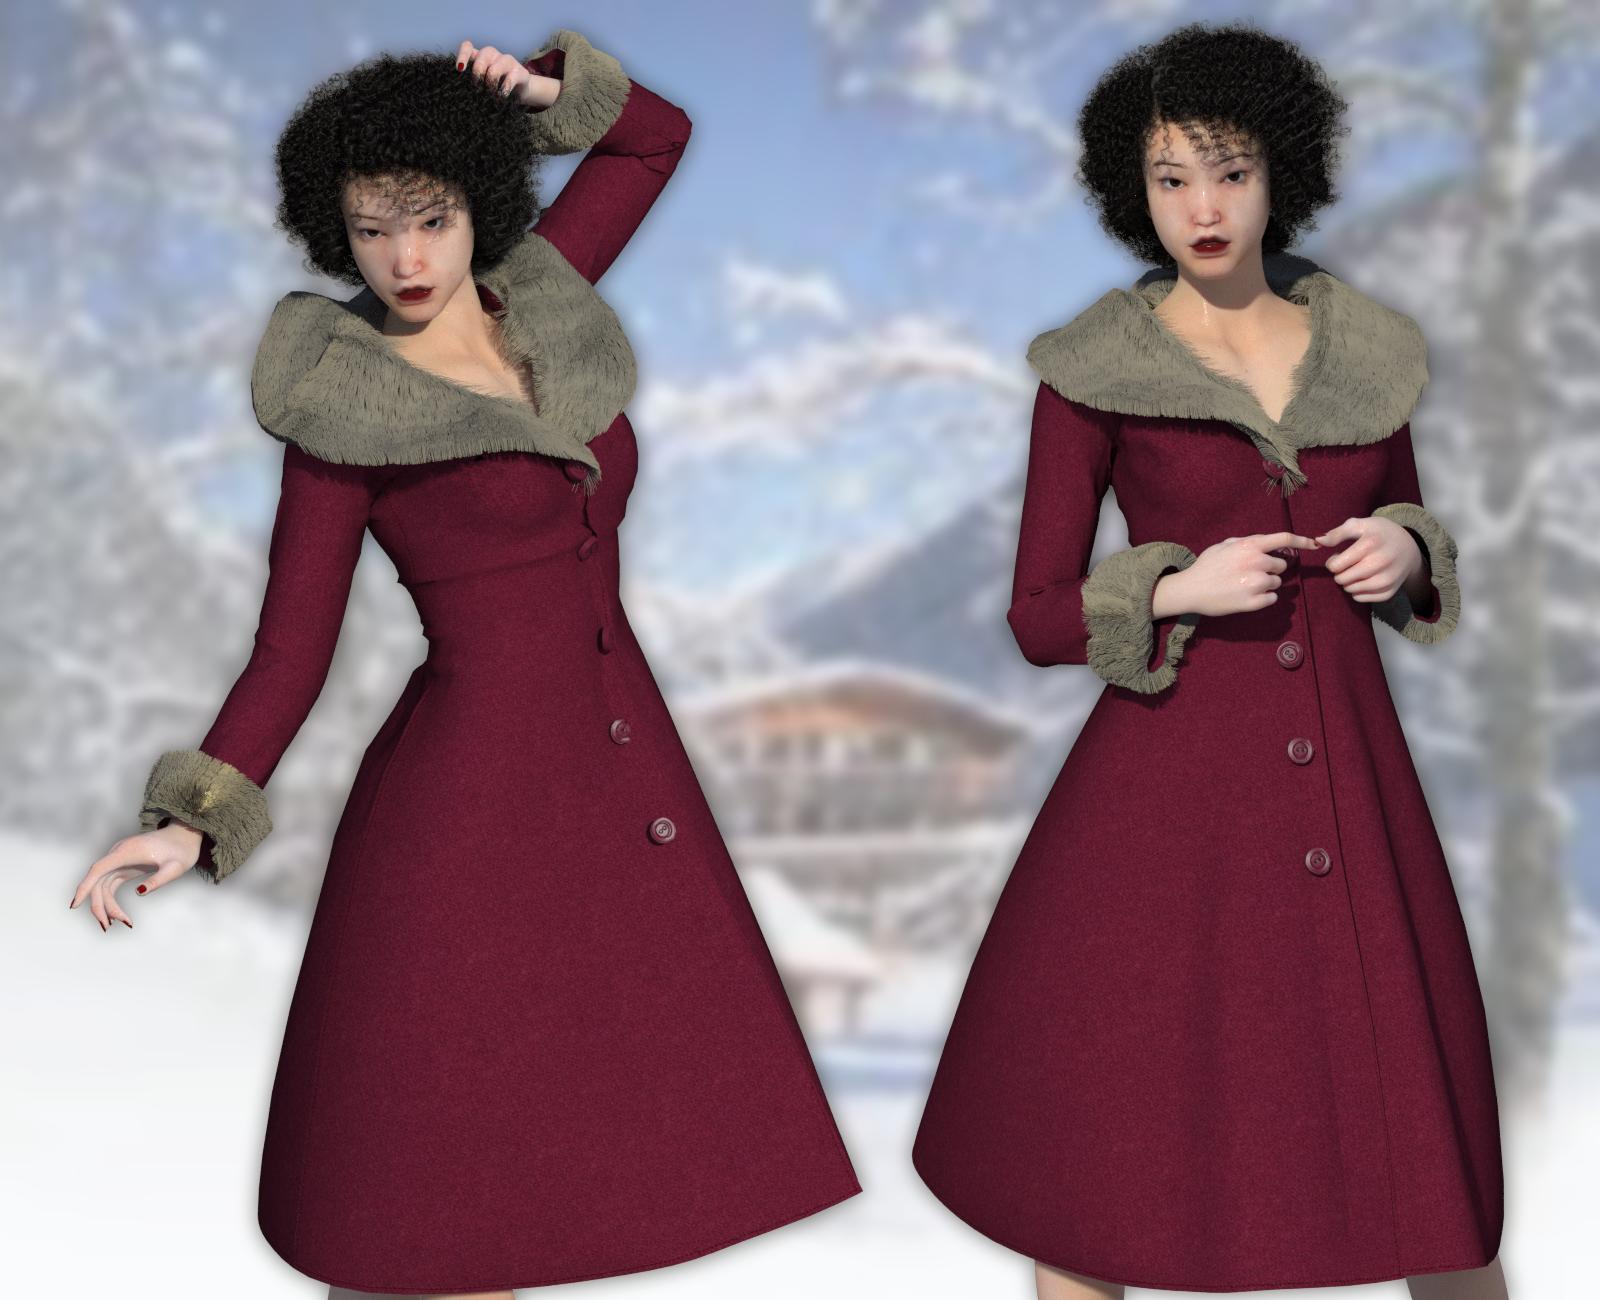 Wintercoat promo1